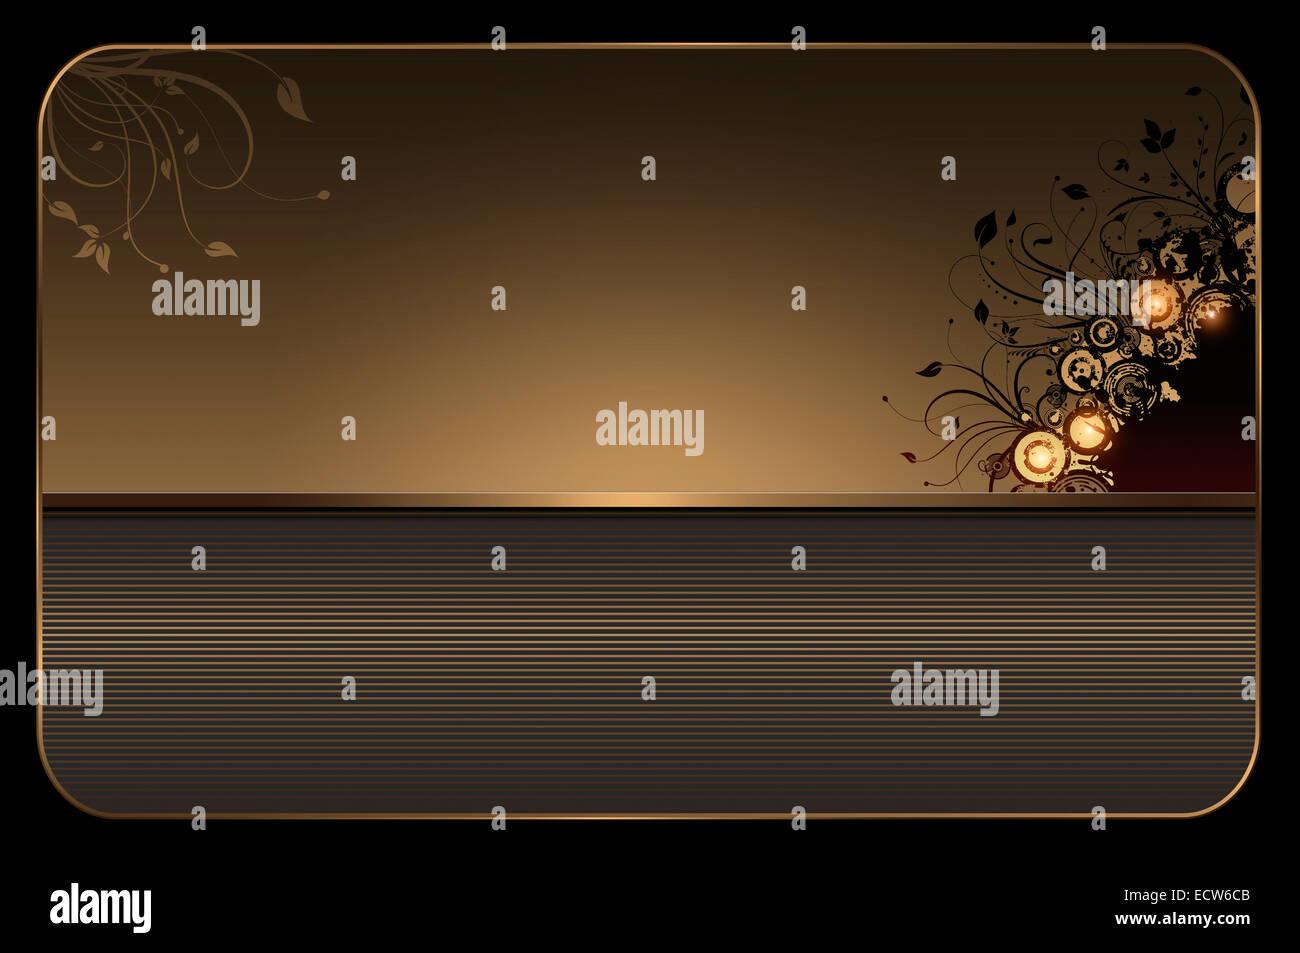 Cashmachine Stockfotos & Cashmachine Bilder - Alamy